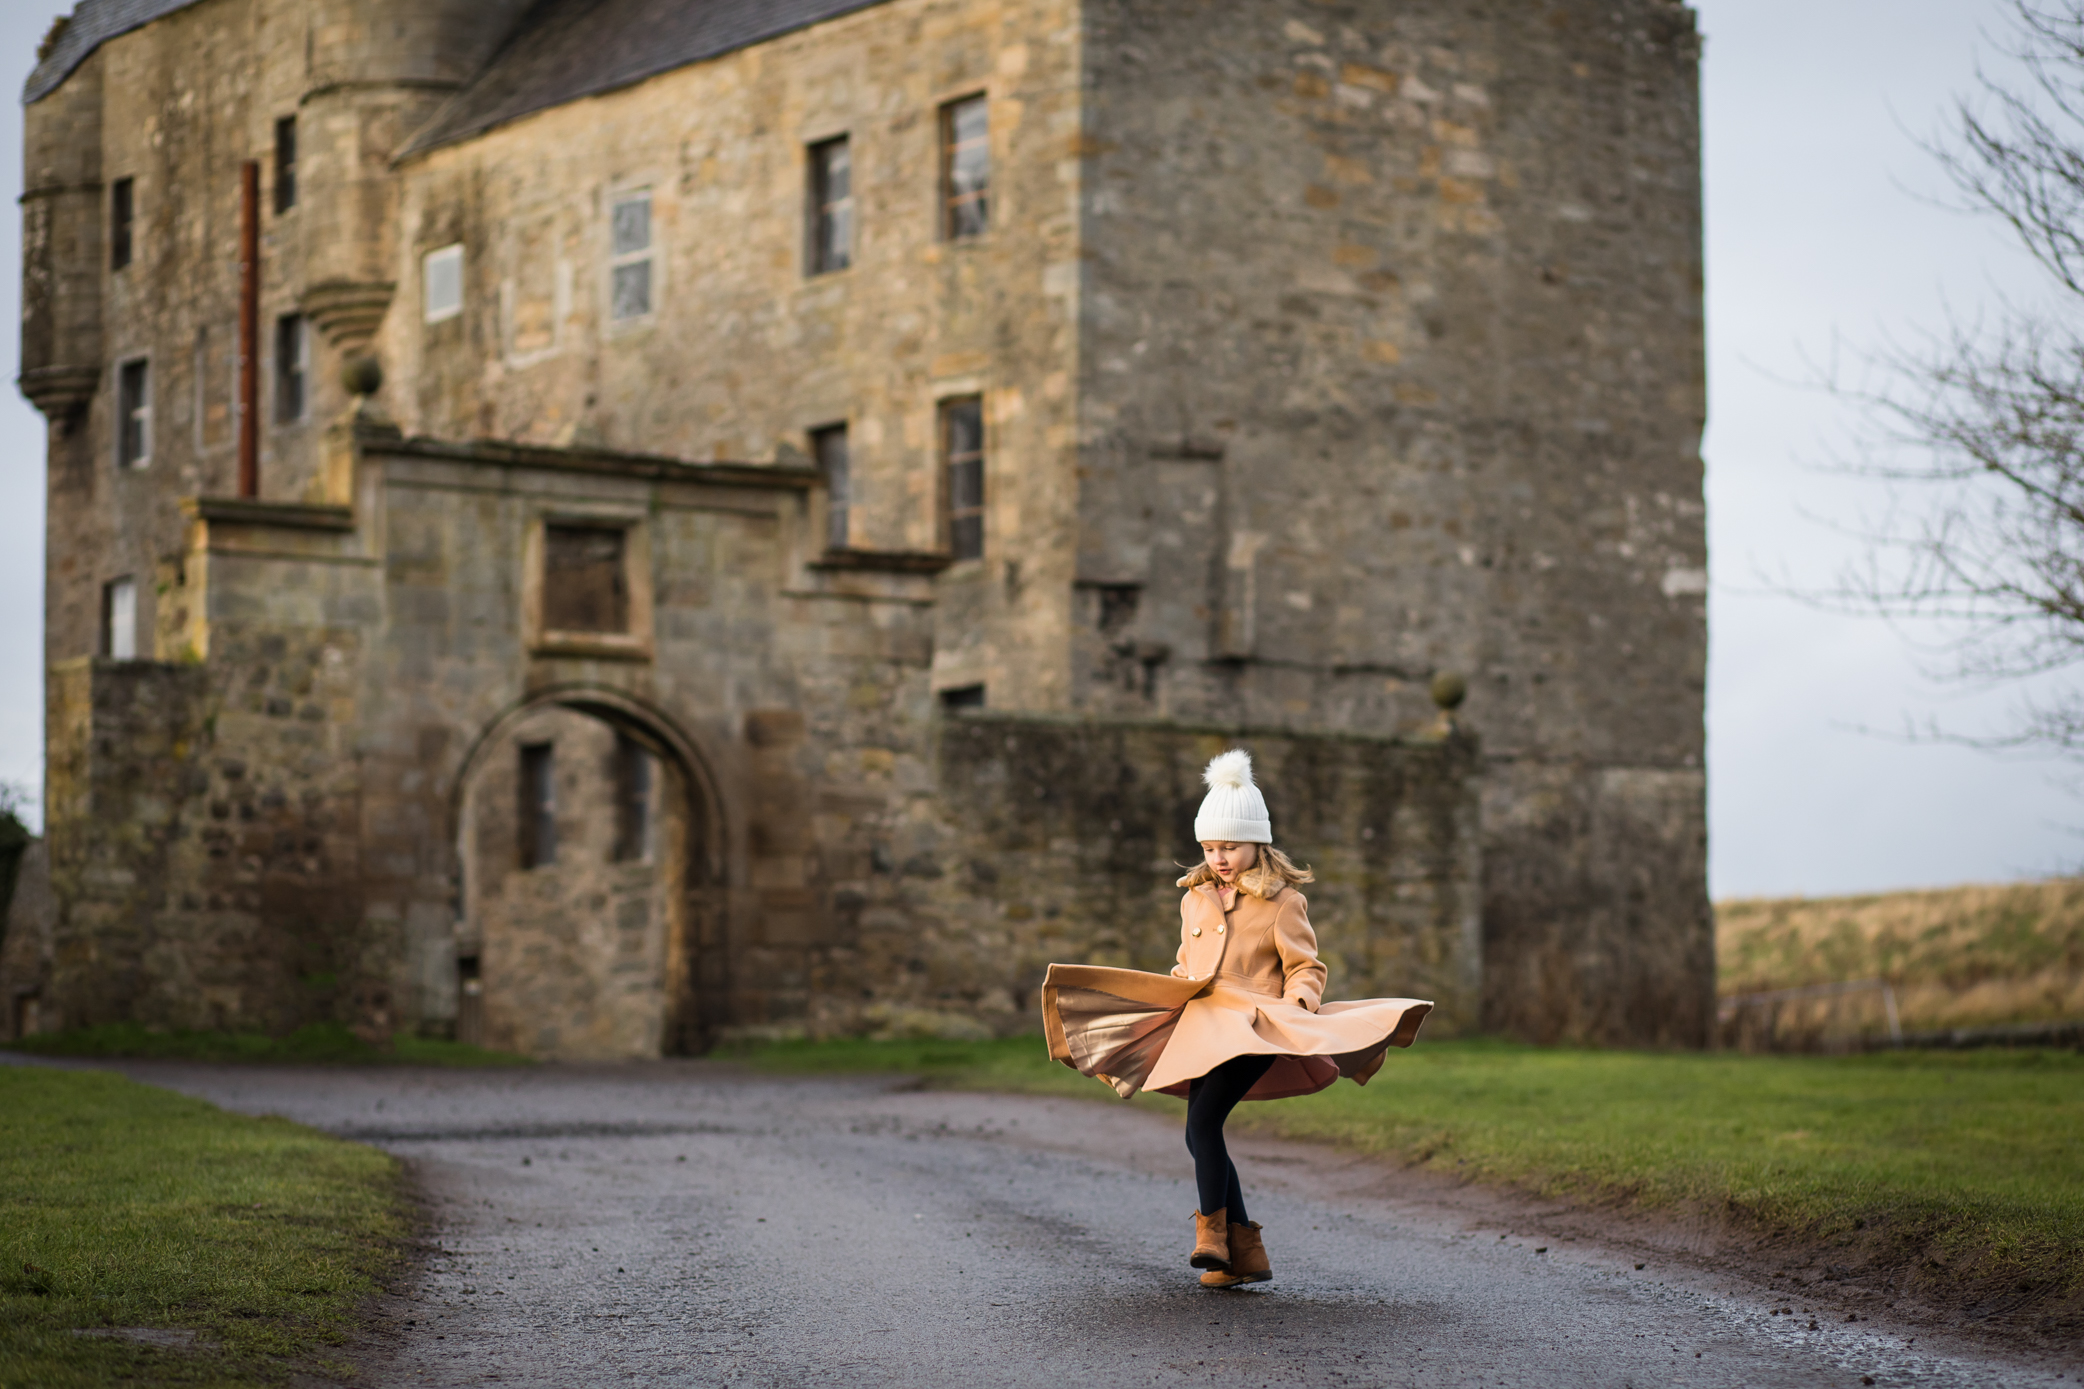 Outlander filming location - Midhope Castle (Lallybroch)